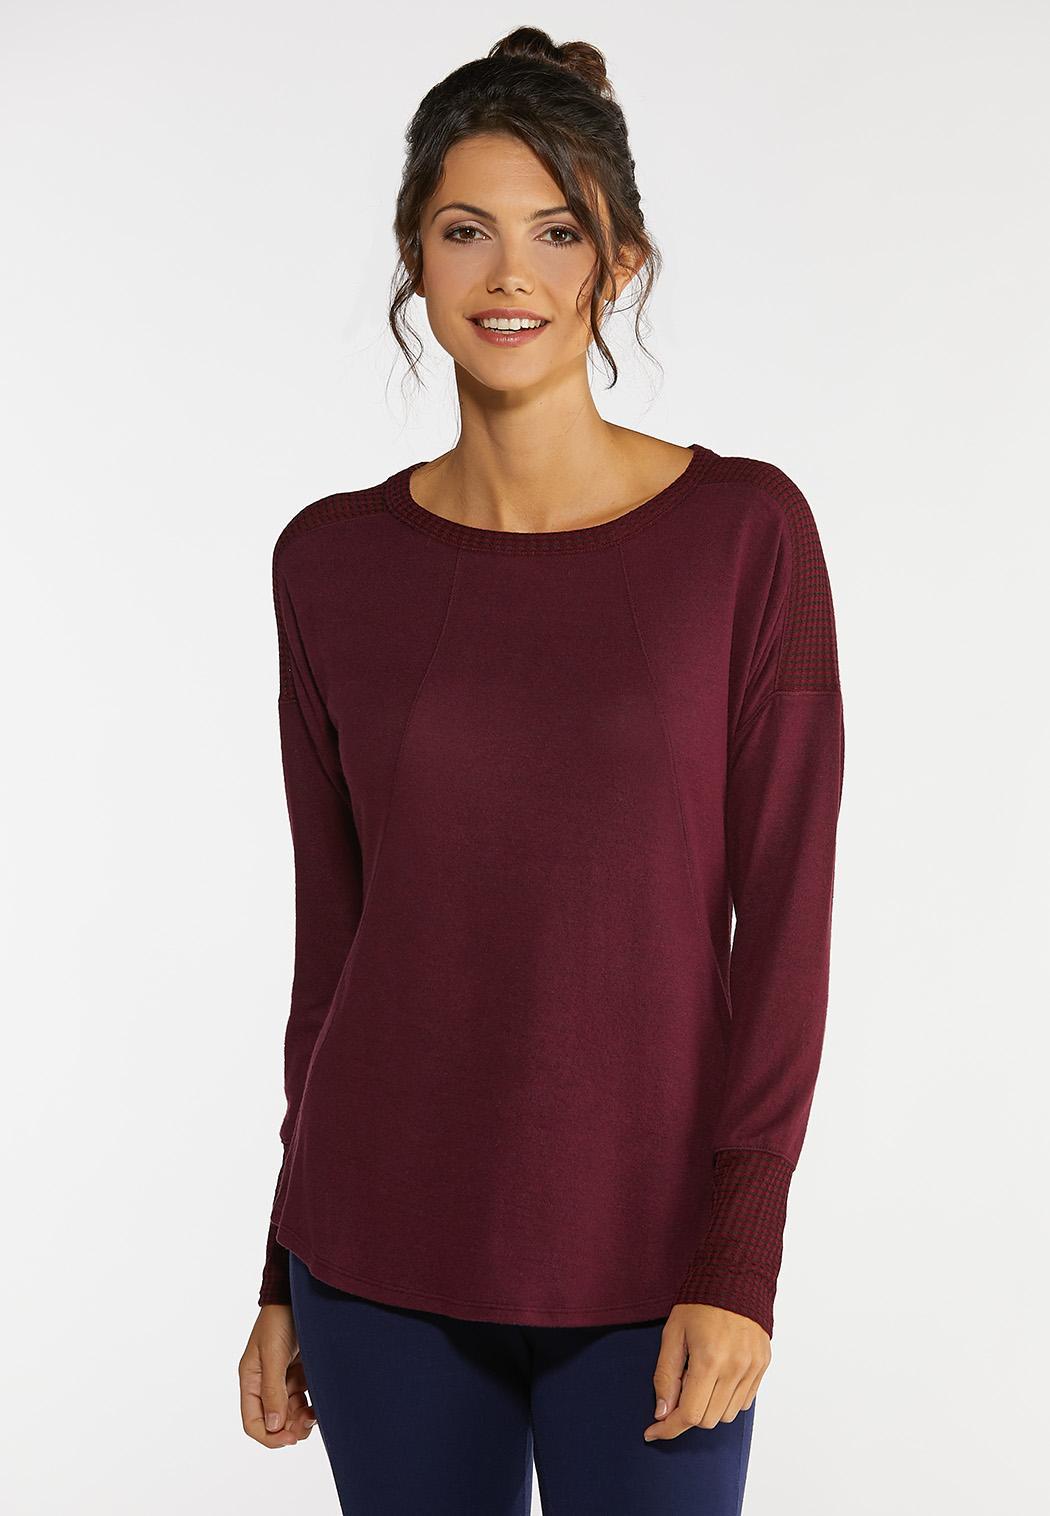 Mixed Knit Tunic Top